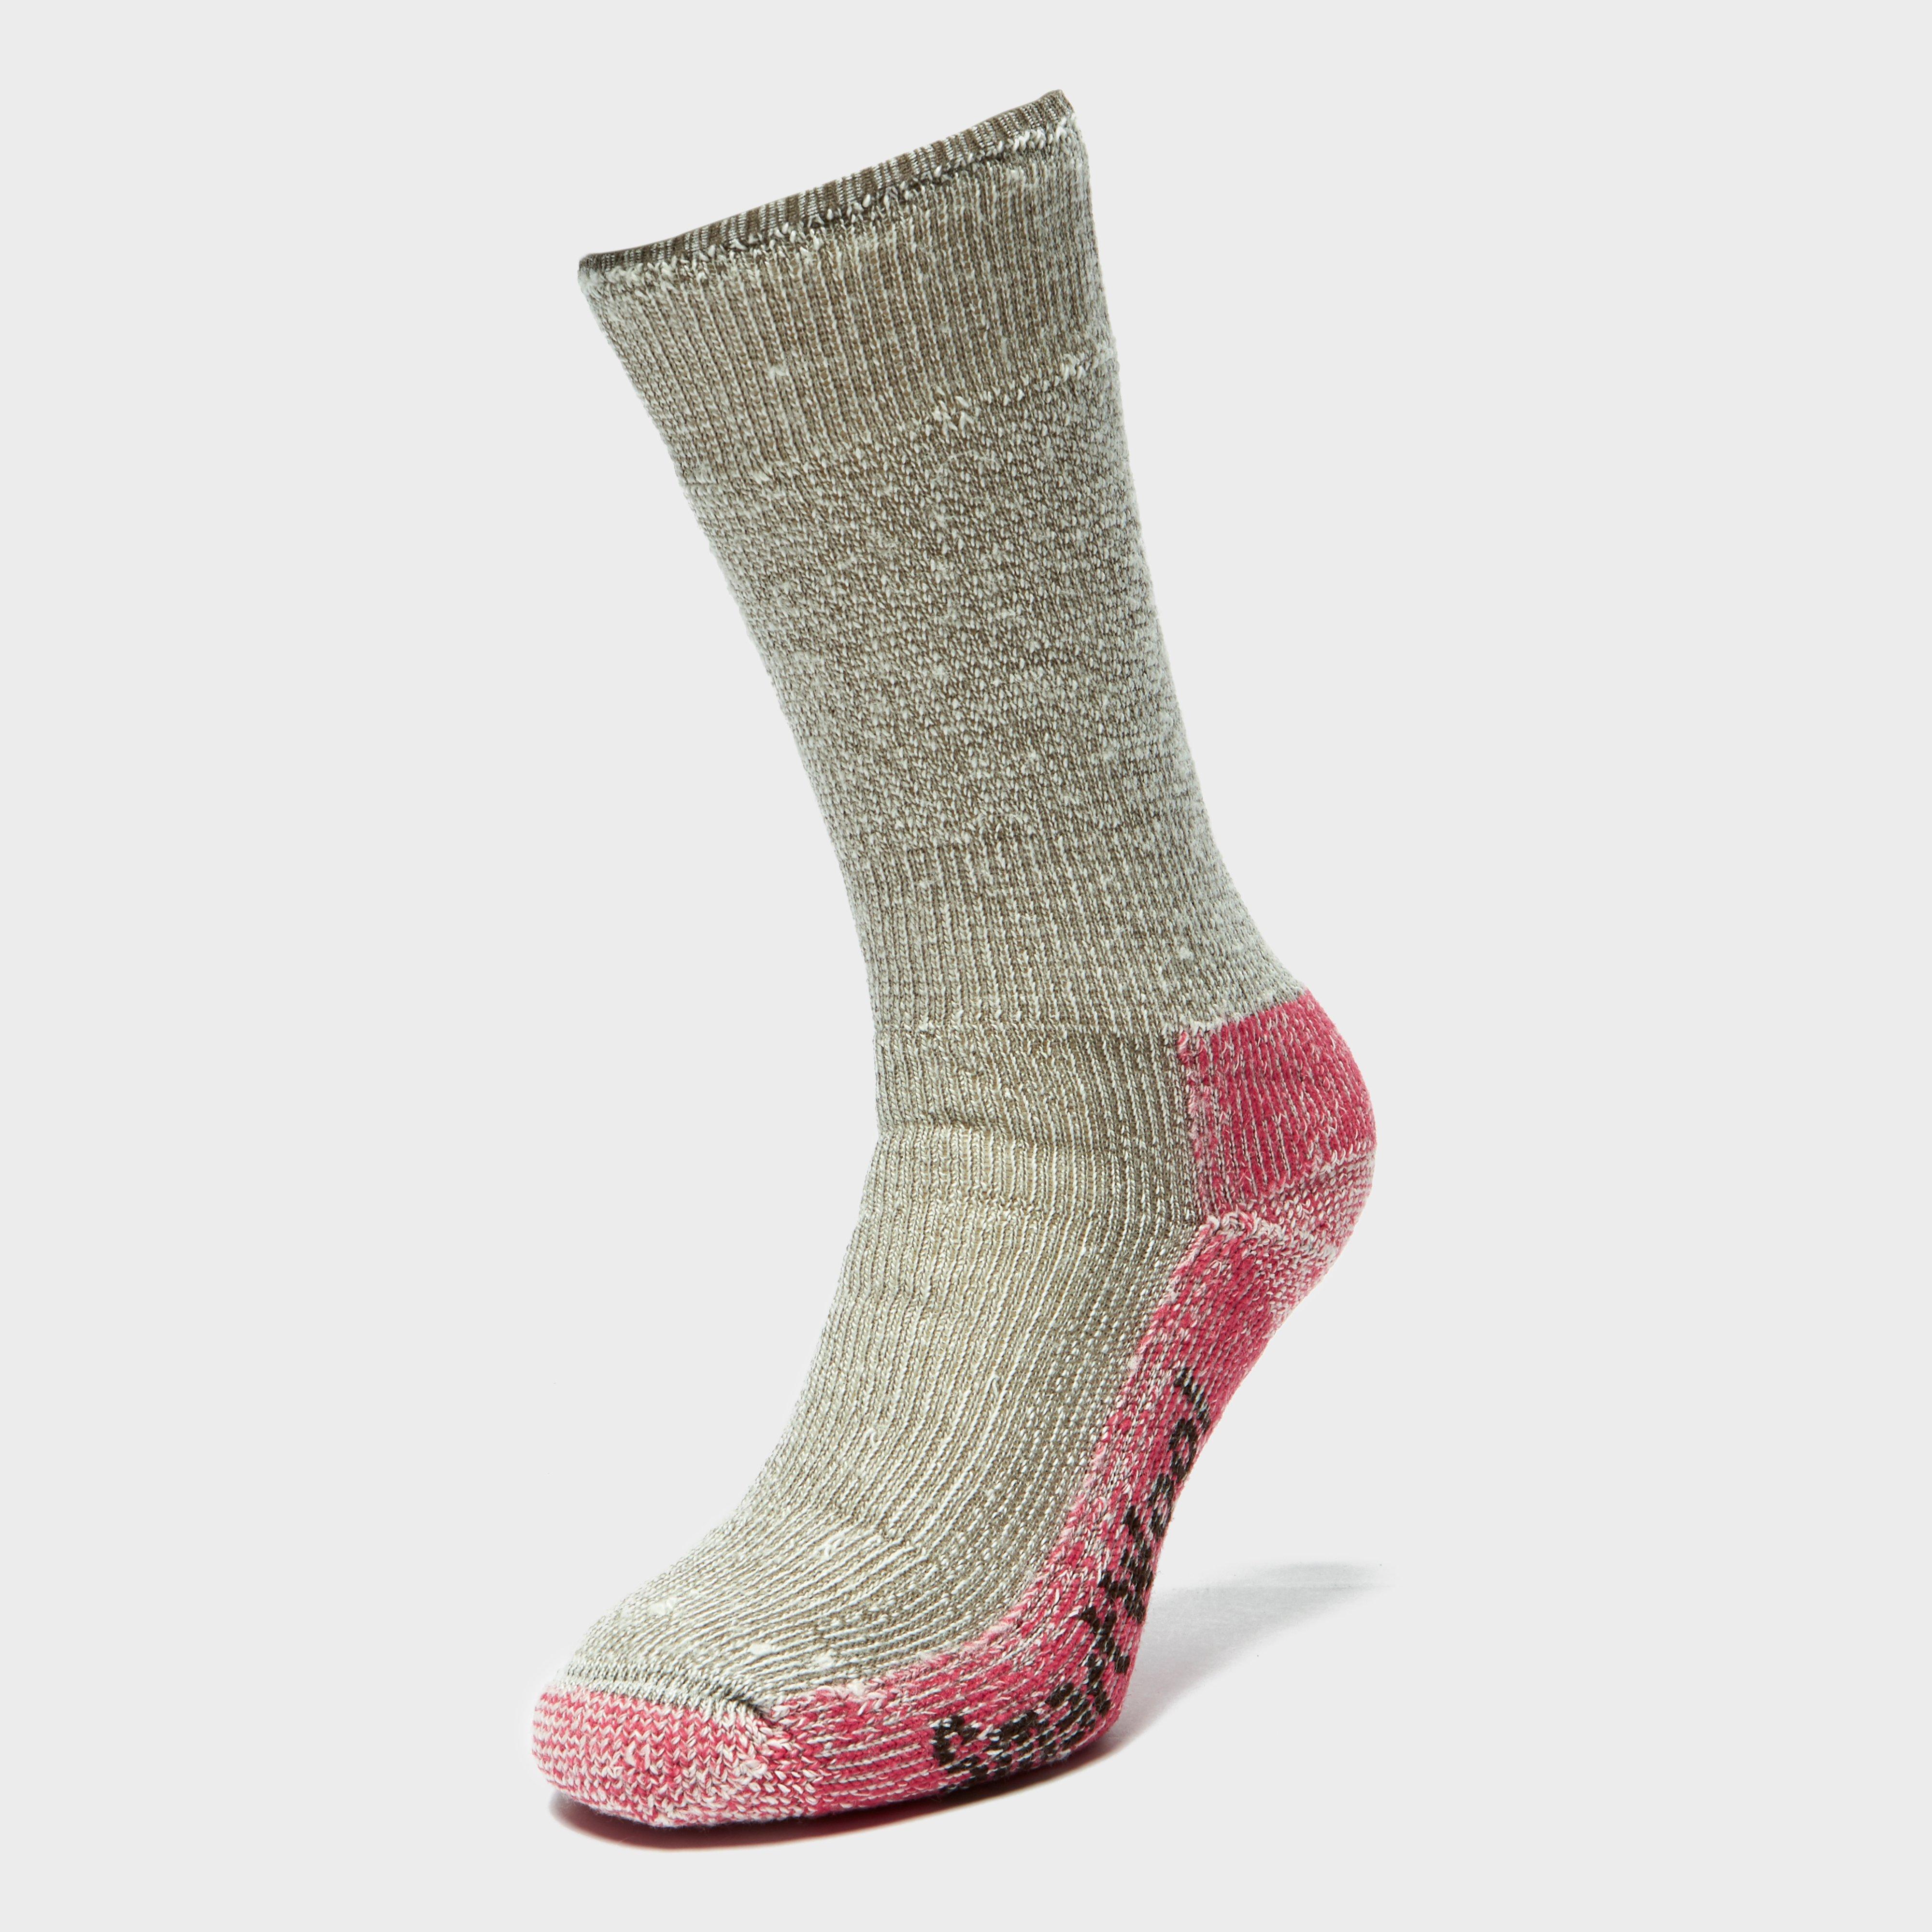 Smartwool Women's Mountaineering Extra Heavy Crew Socks, Grey